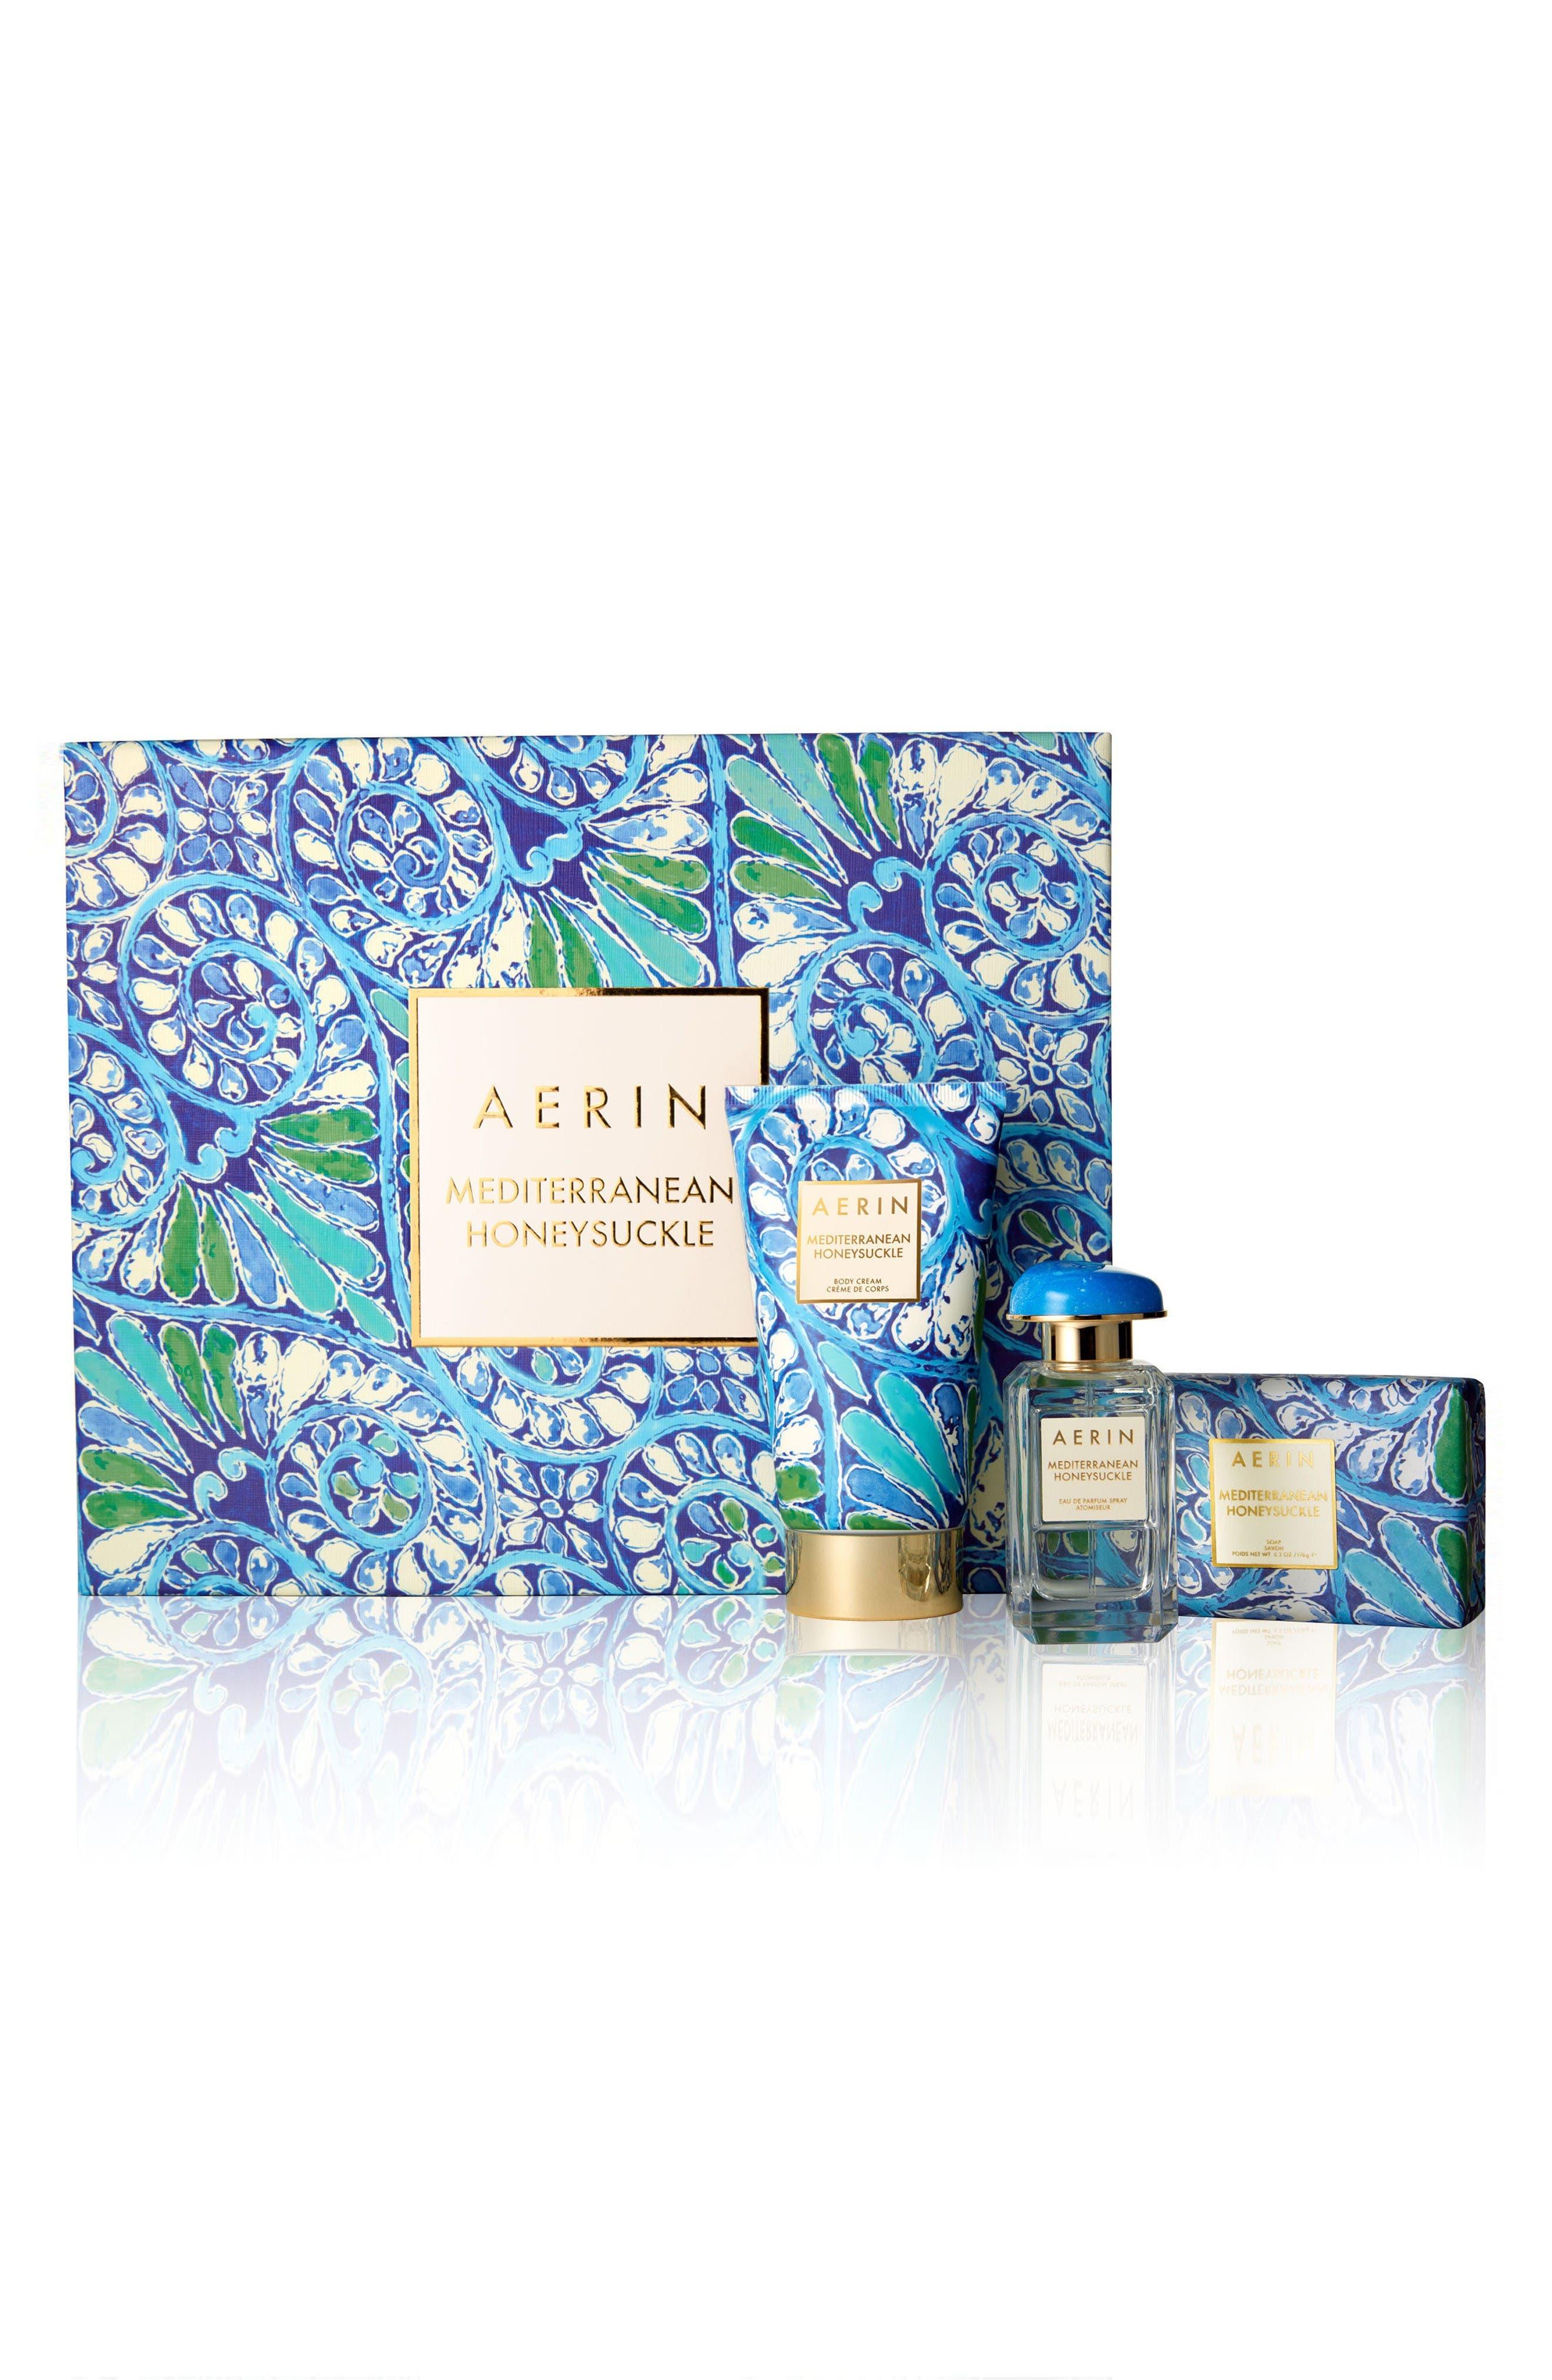 AERIN Beauty Mediterranean Honeysuckle Eau de Parfum Collection,                             Alternate thumbnail 2, color,                             No Color